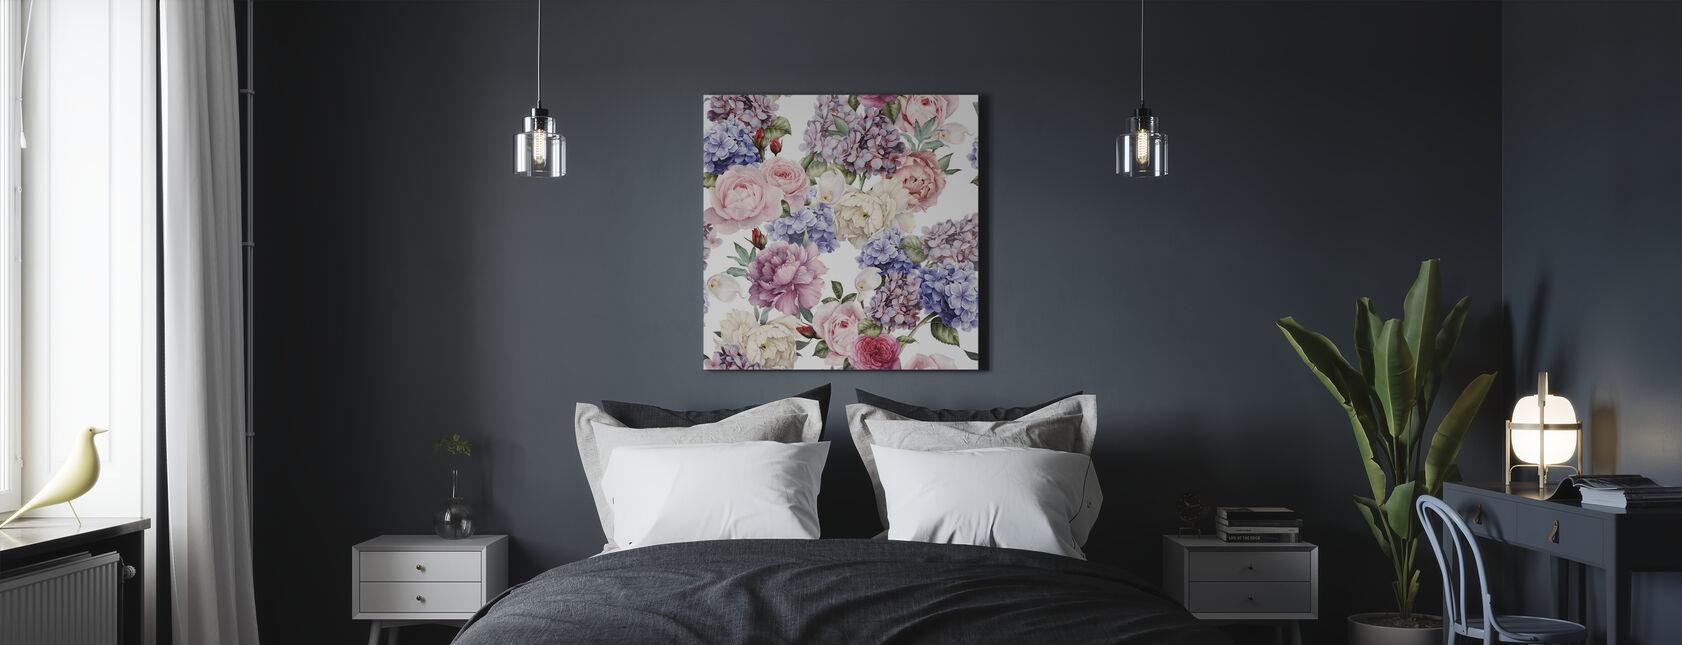 Endless Summer - Canvas print - Bedroom